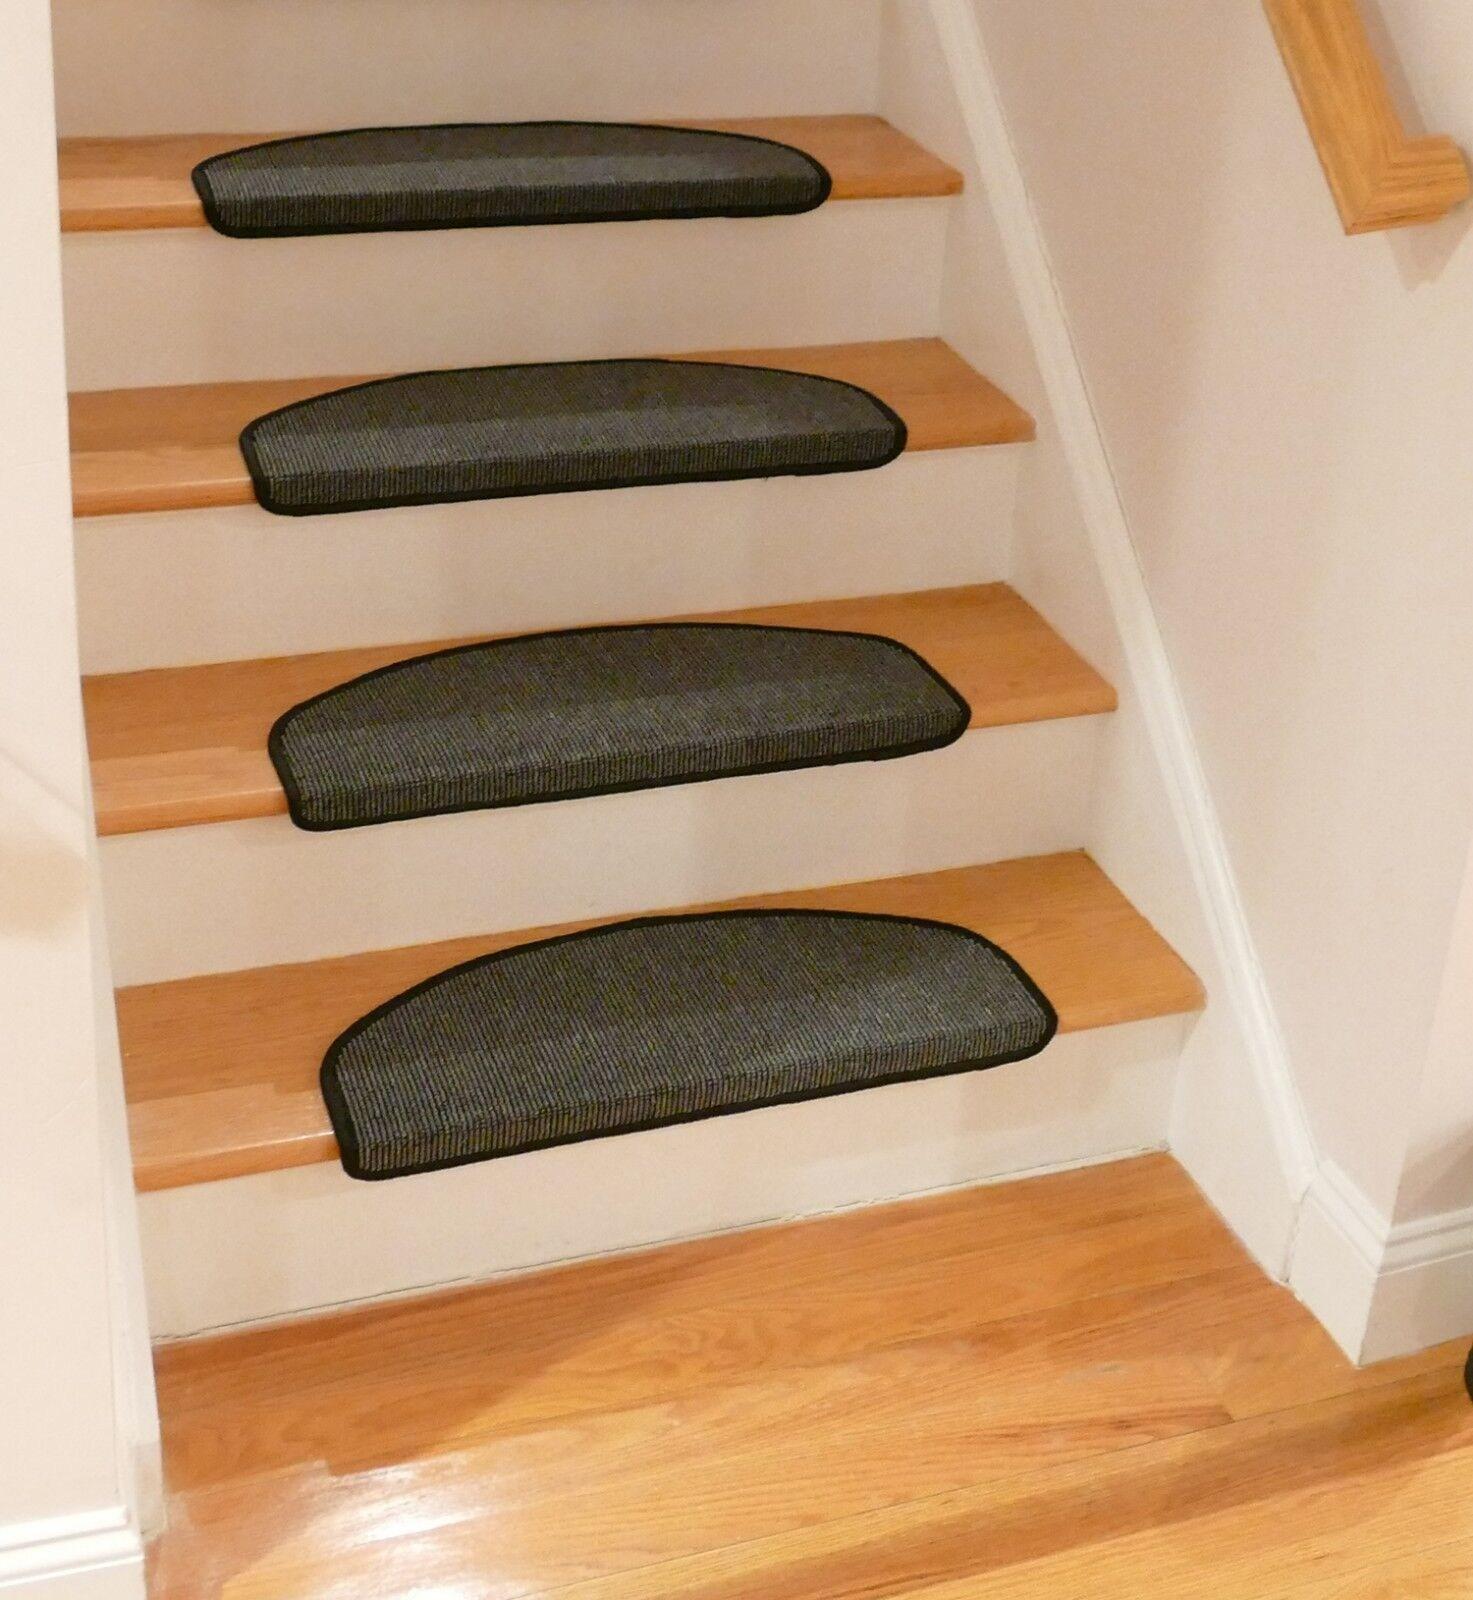 Dean Carpet Stair Treads 27 X 9 Emerald Green Set Of 13 2 | Dean Carpet Stair Treads | Pet Friendly | Gripper Tape | Friendly Diy | Rug | Modern Diy